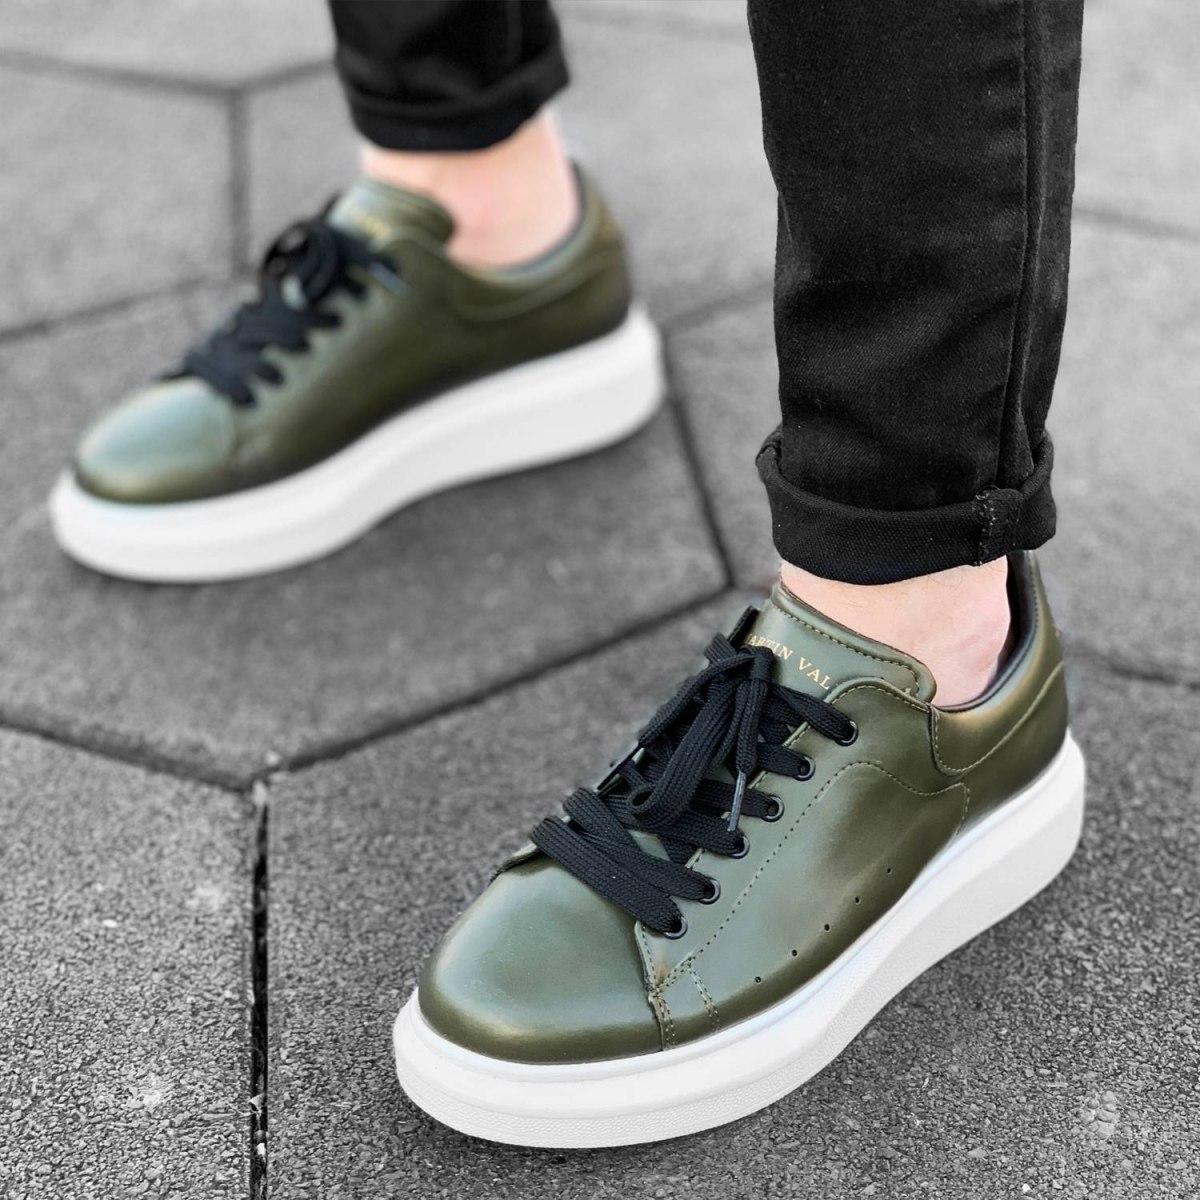 Hype Sole Sneakers in Khaki-White - 2